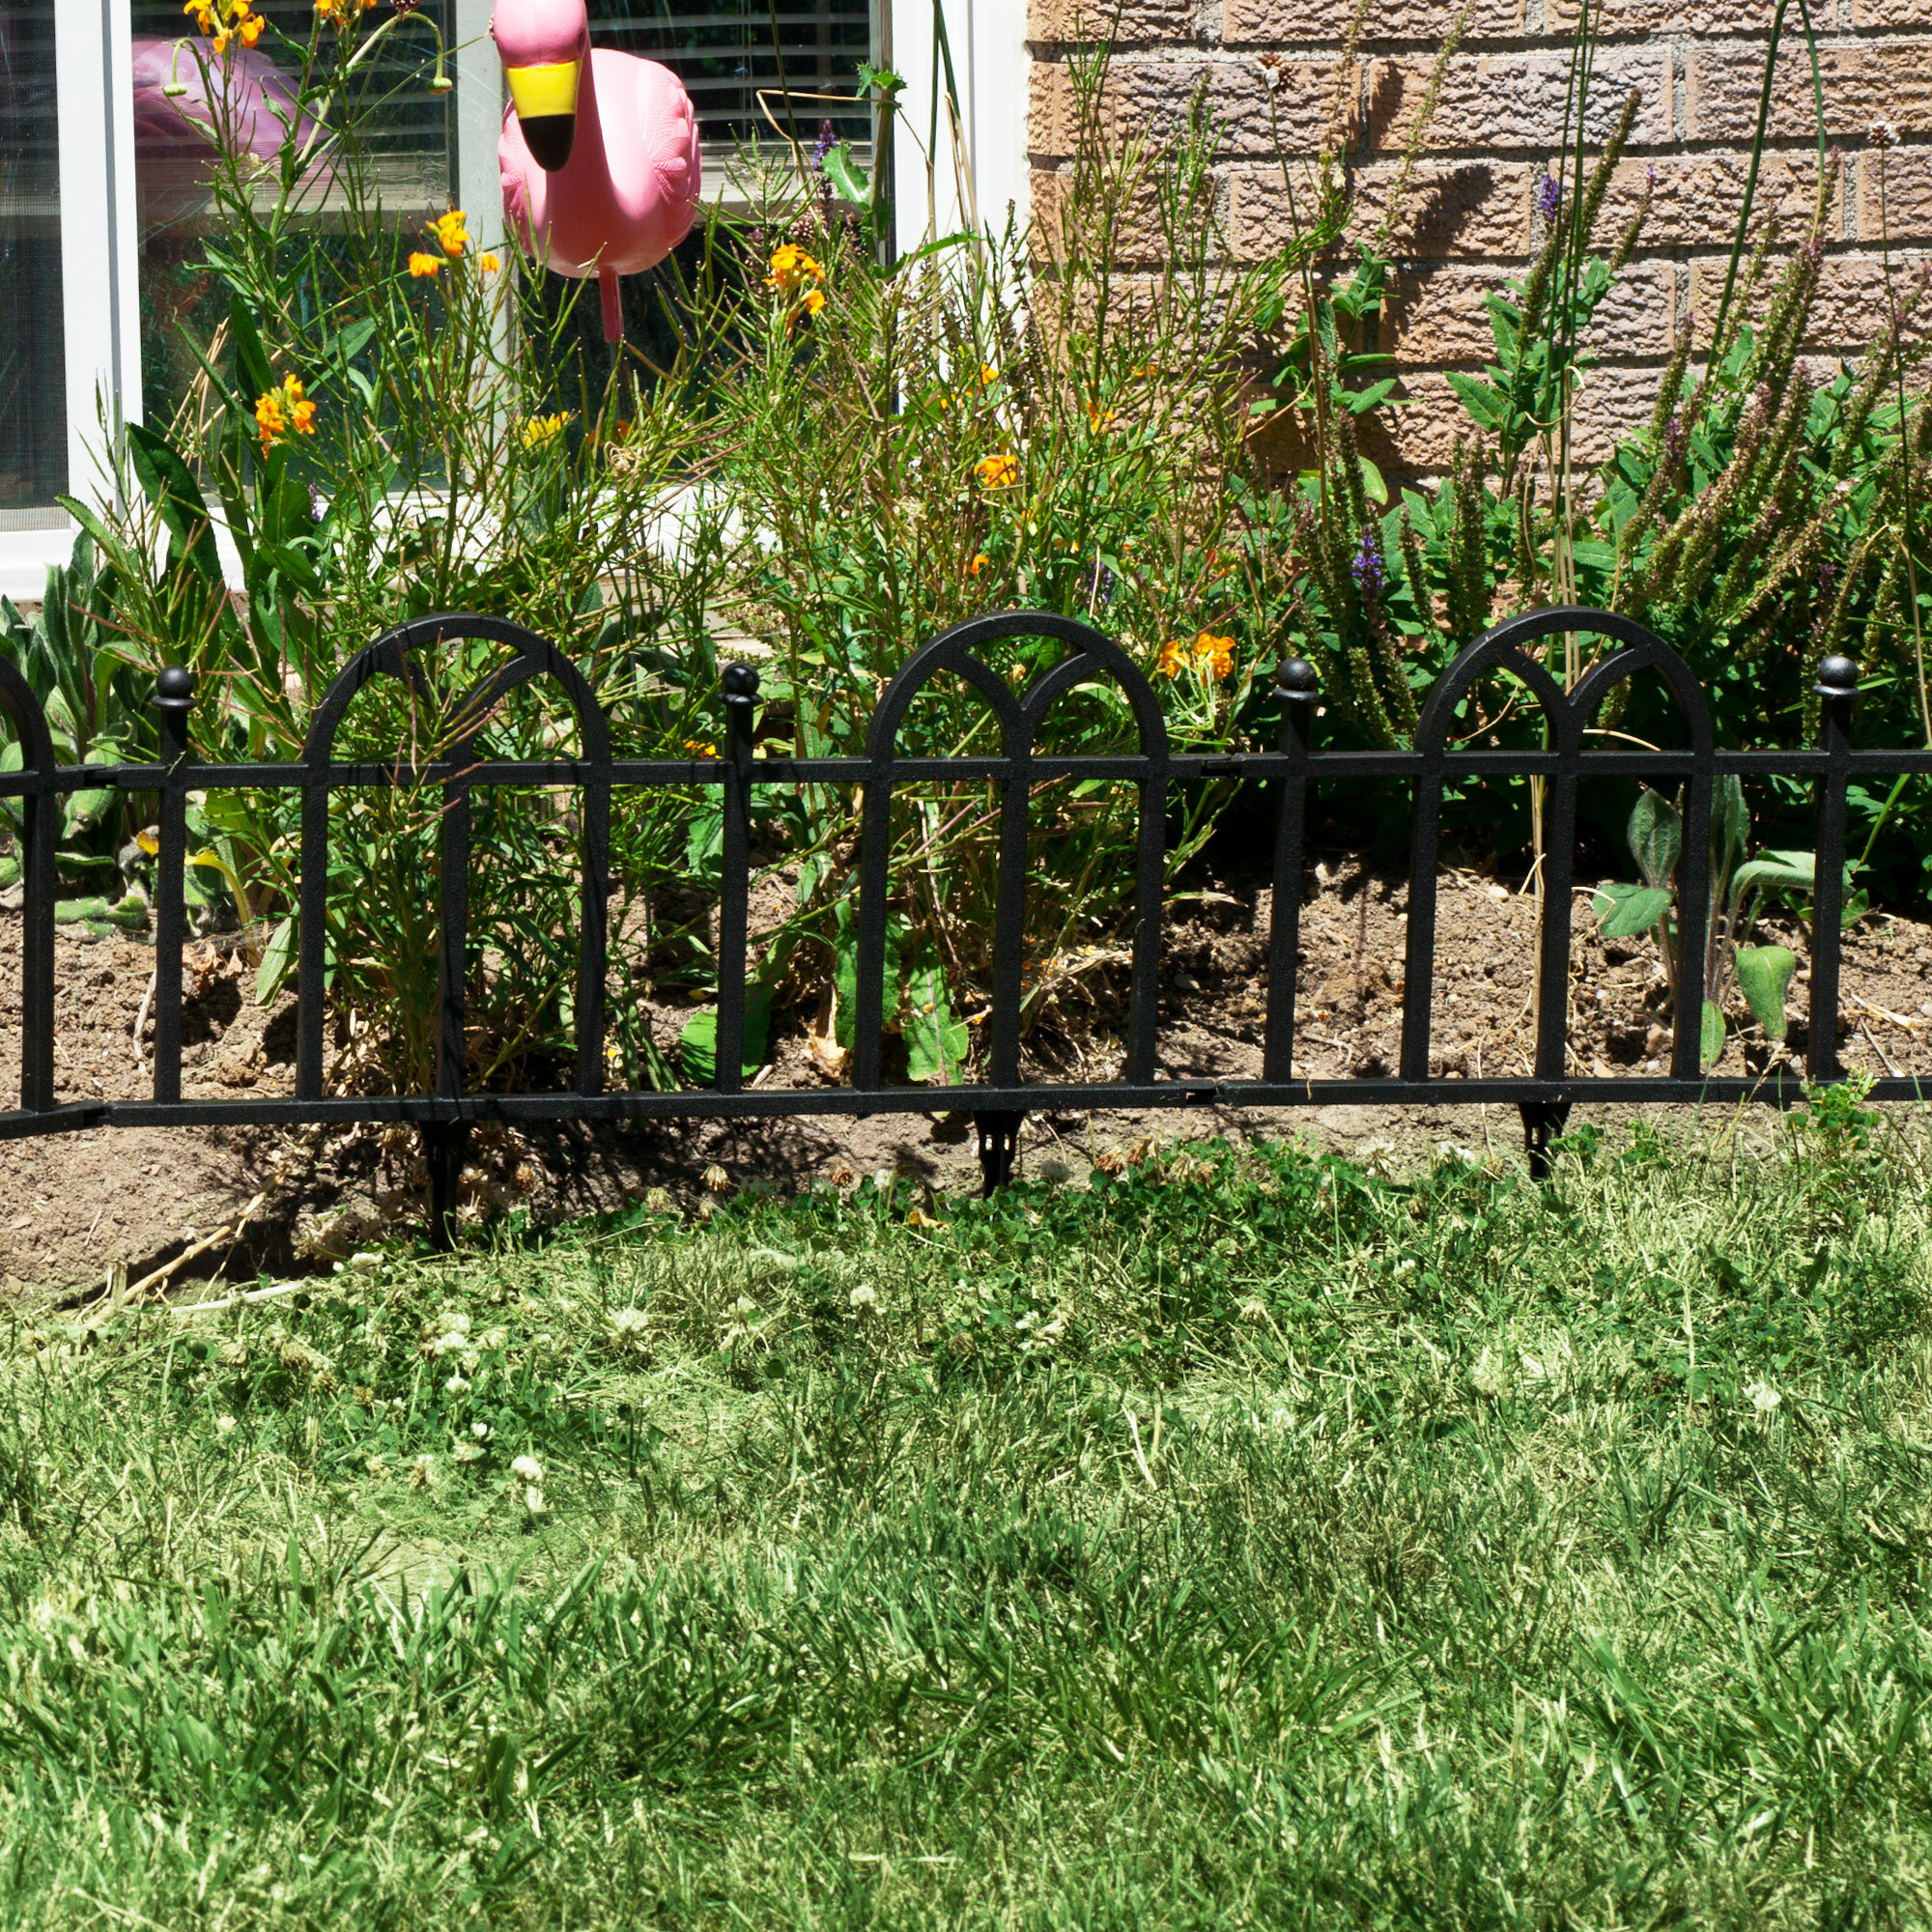 Pure Garden 15.8 in. x 24 in. Victorian Garden Border Fencing ...